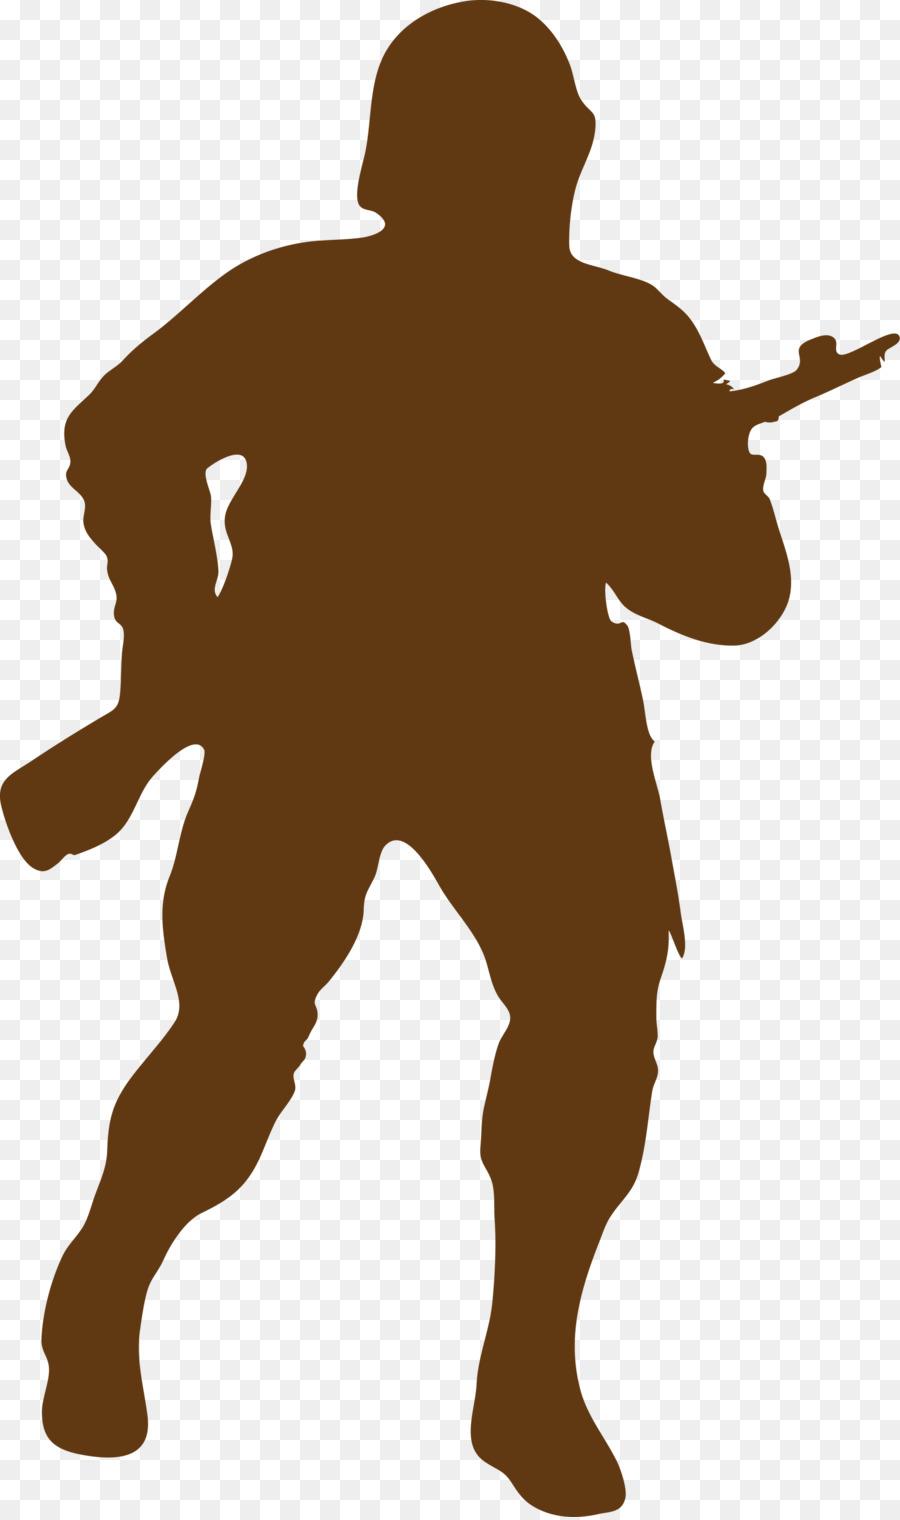 900x1520 Soldier Combat Military Rank